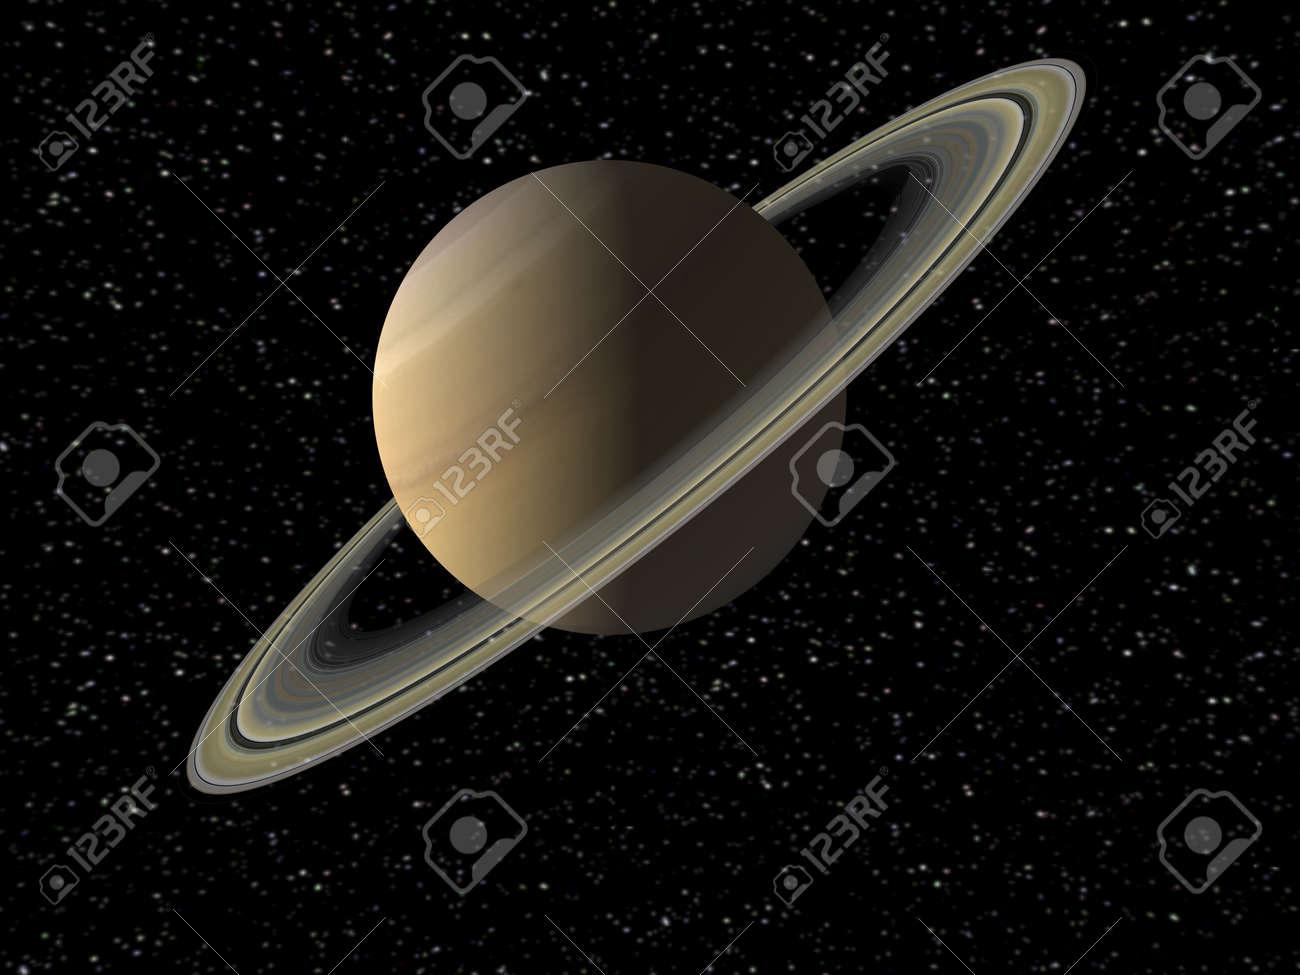 Saturne Banque d'images - 15533907